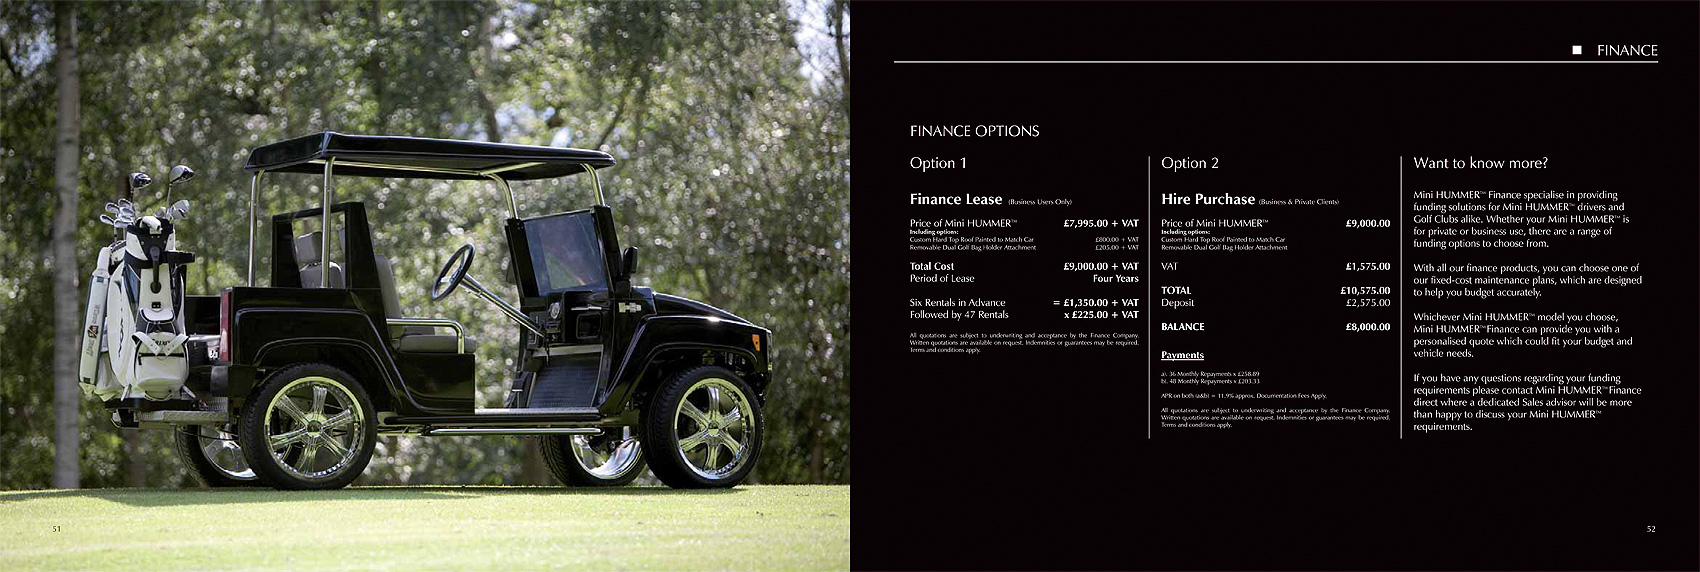 Hummer H3 accessories brochure